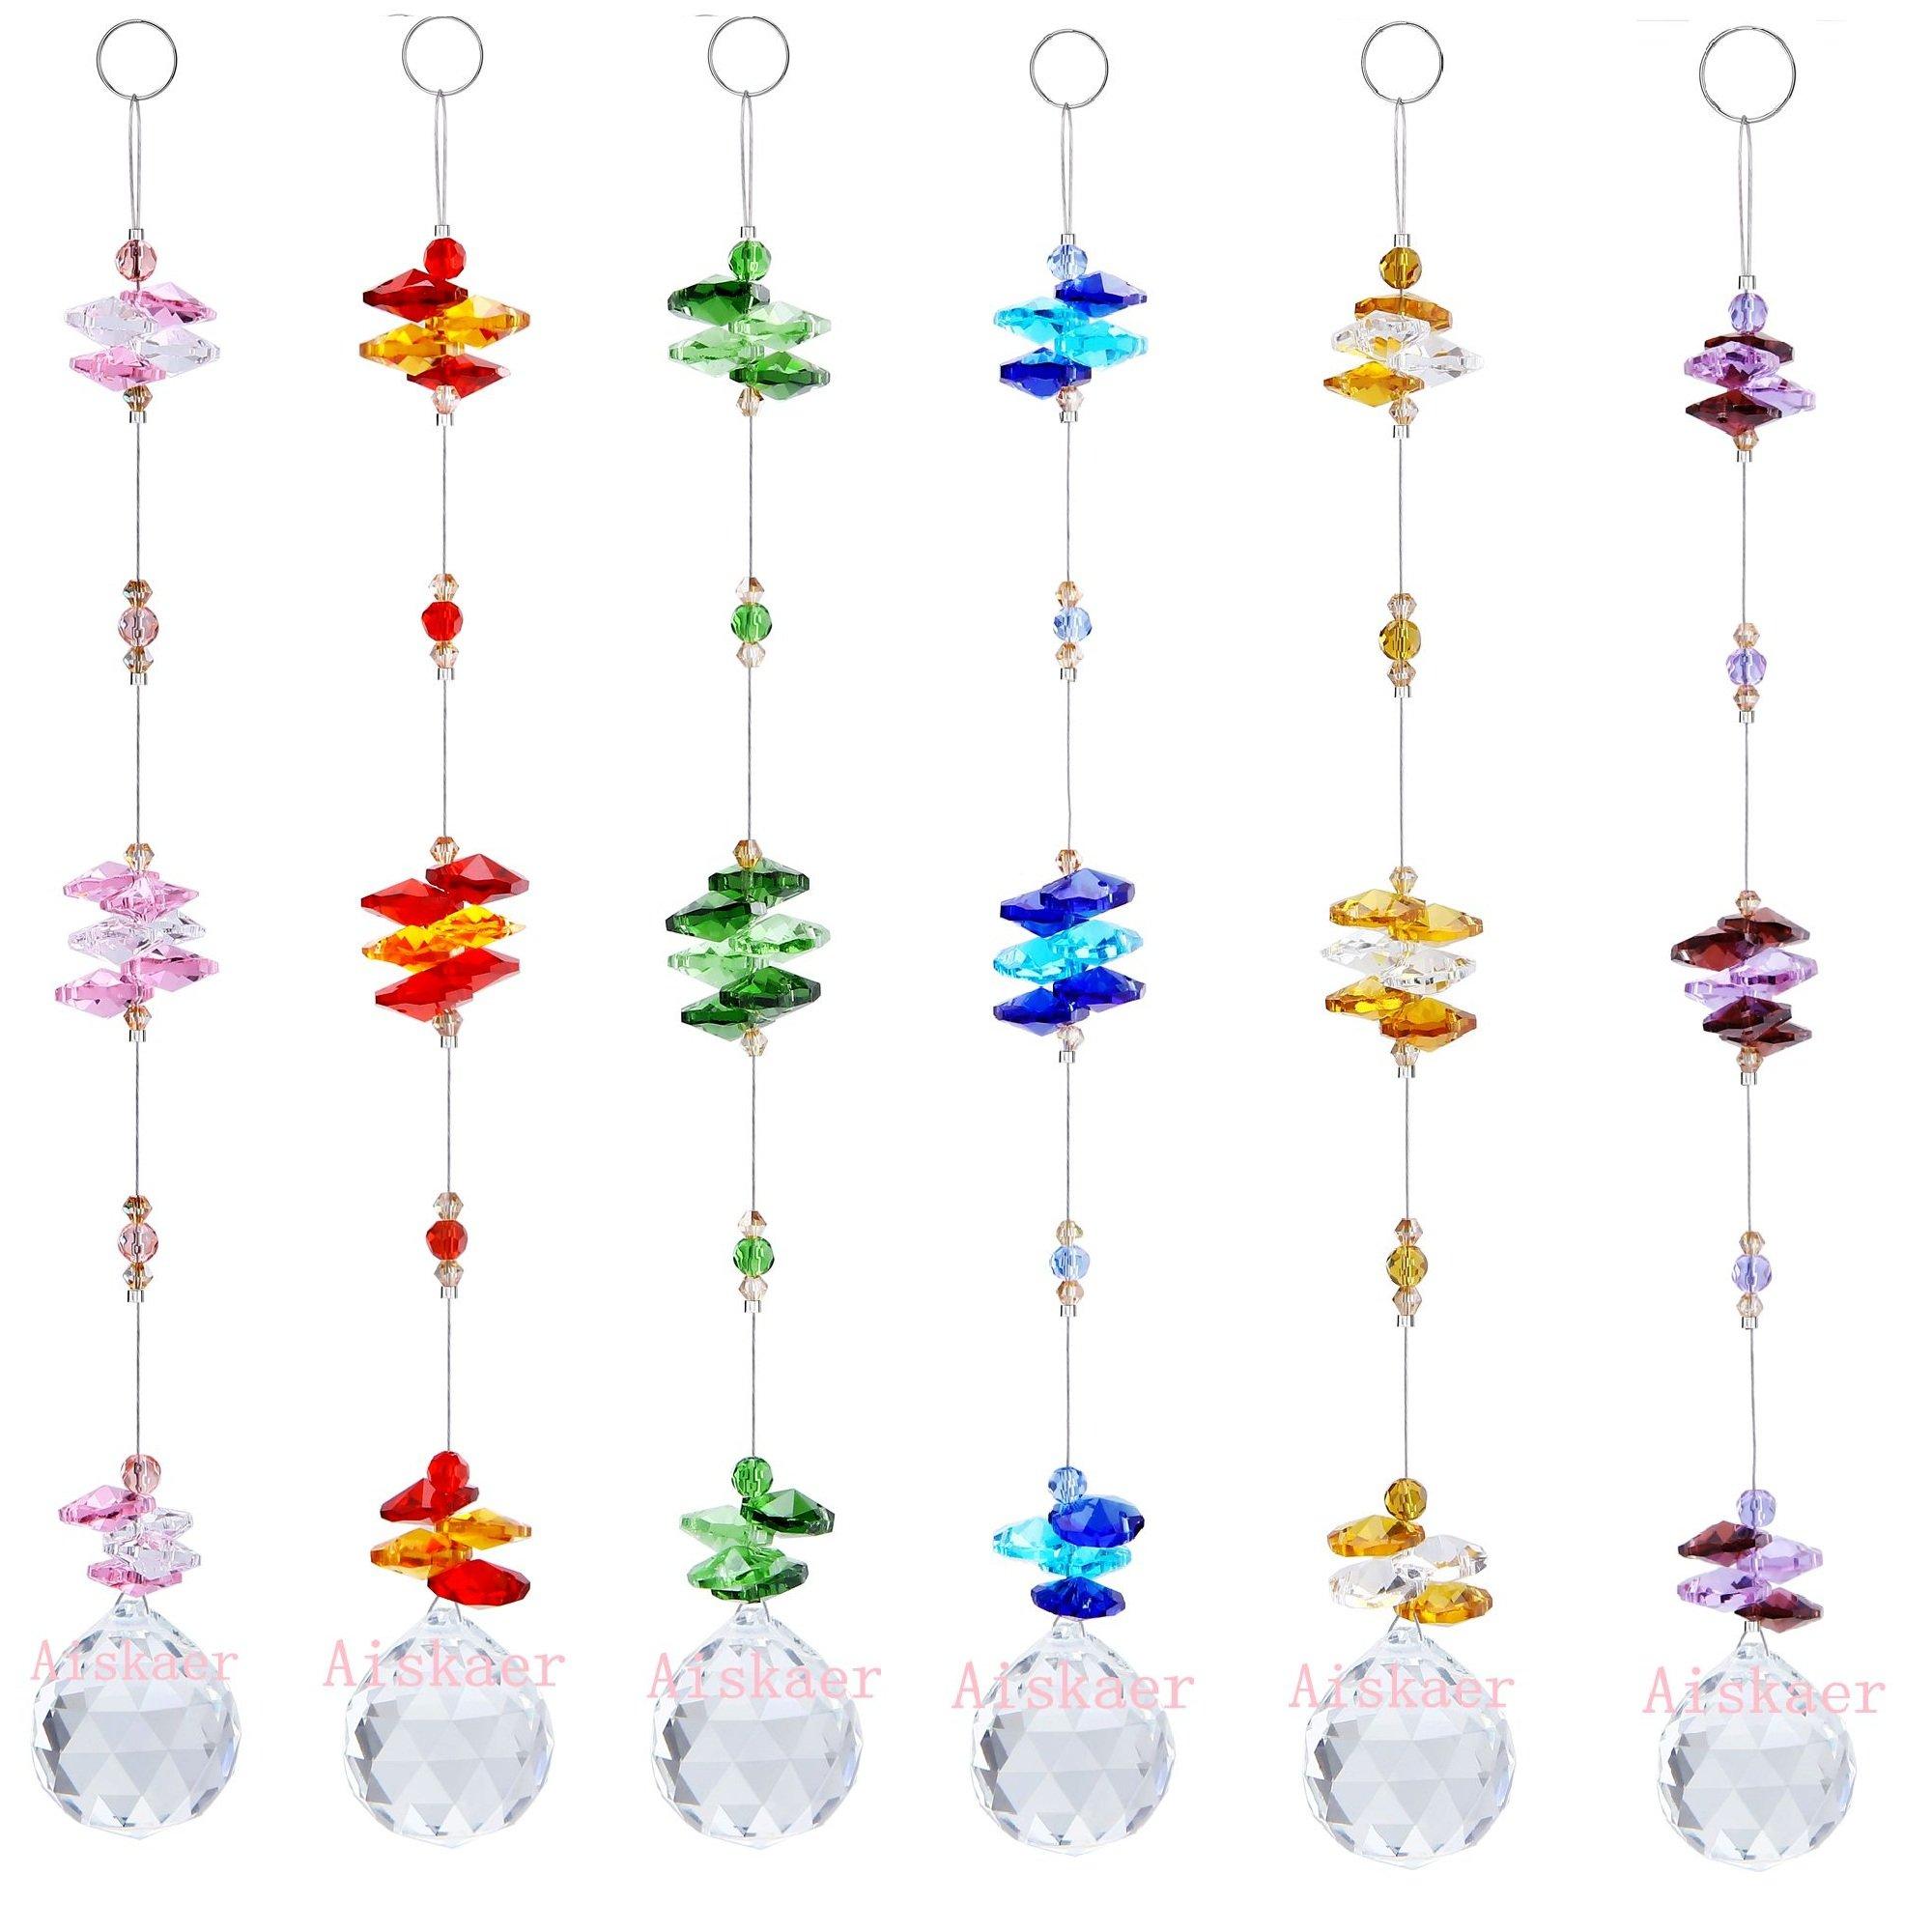 Aiskaer 6PCS 1.2 Inch Colorful Chandelier Crystal Ball Prisms Pendant, Chandelier Decor Hanging Prism Ornaments,Chandelier Crystals Ball window Prisms Rainbow Octogon Chakra Suncatcher